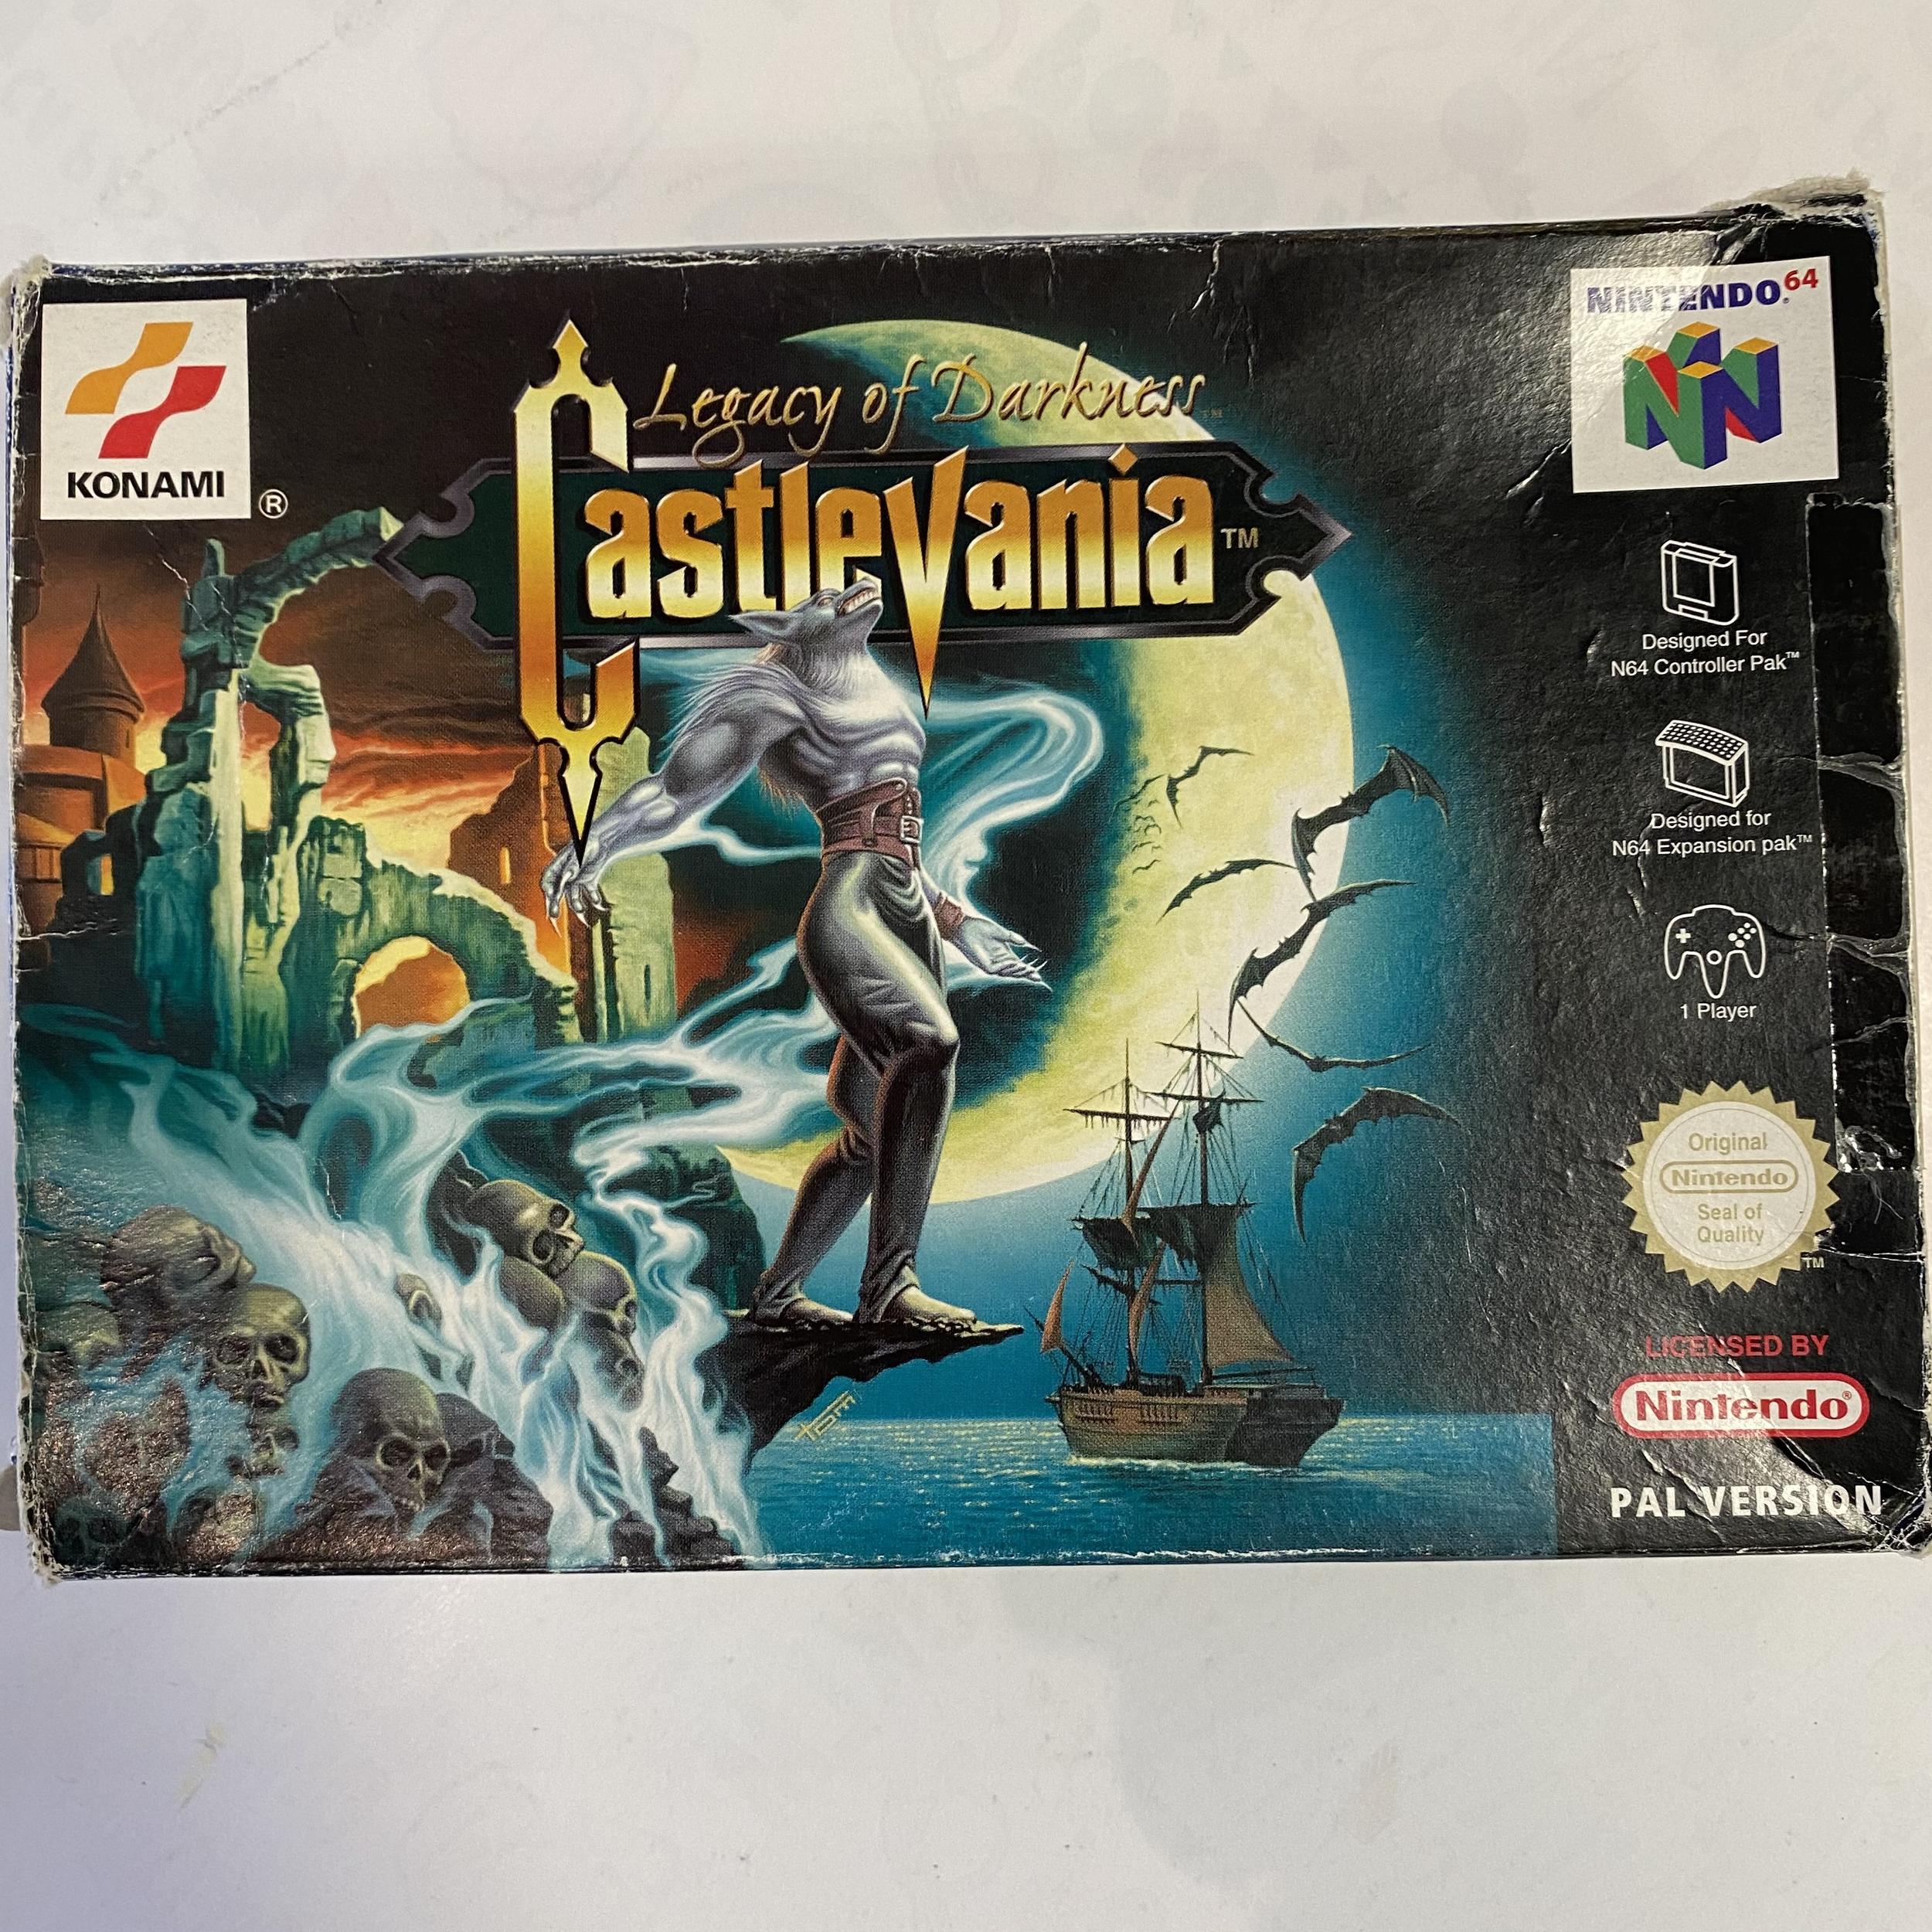 Nintendo 64 - Castlevania Legacy of Darkness occasion